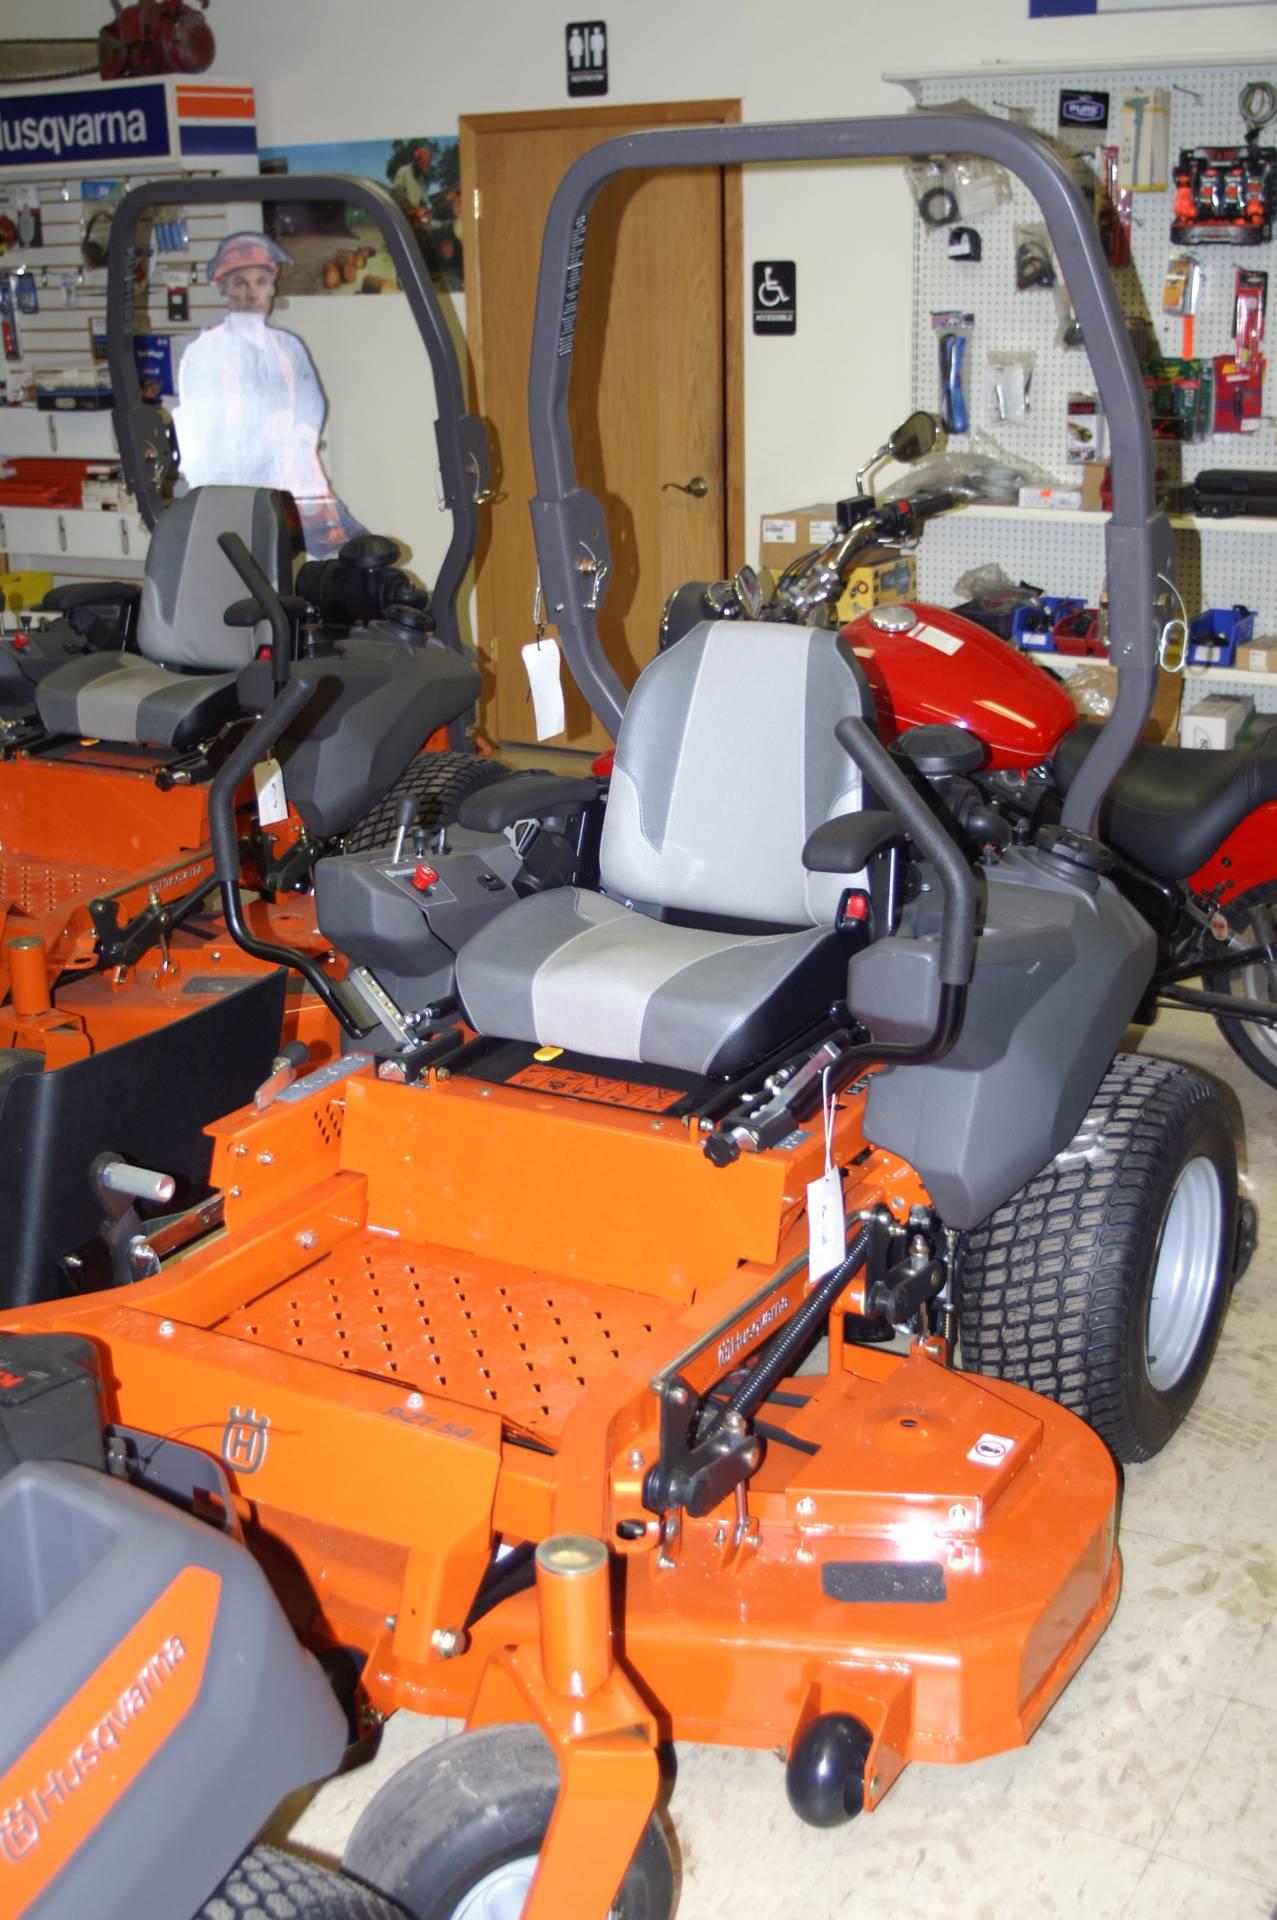 Minnesota Polaris Honda Power Equipment Atv Lawn Mower Dealer Fuel Filter 2016 Husqvarna P Zt 54 Kawasaki In Bigfork